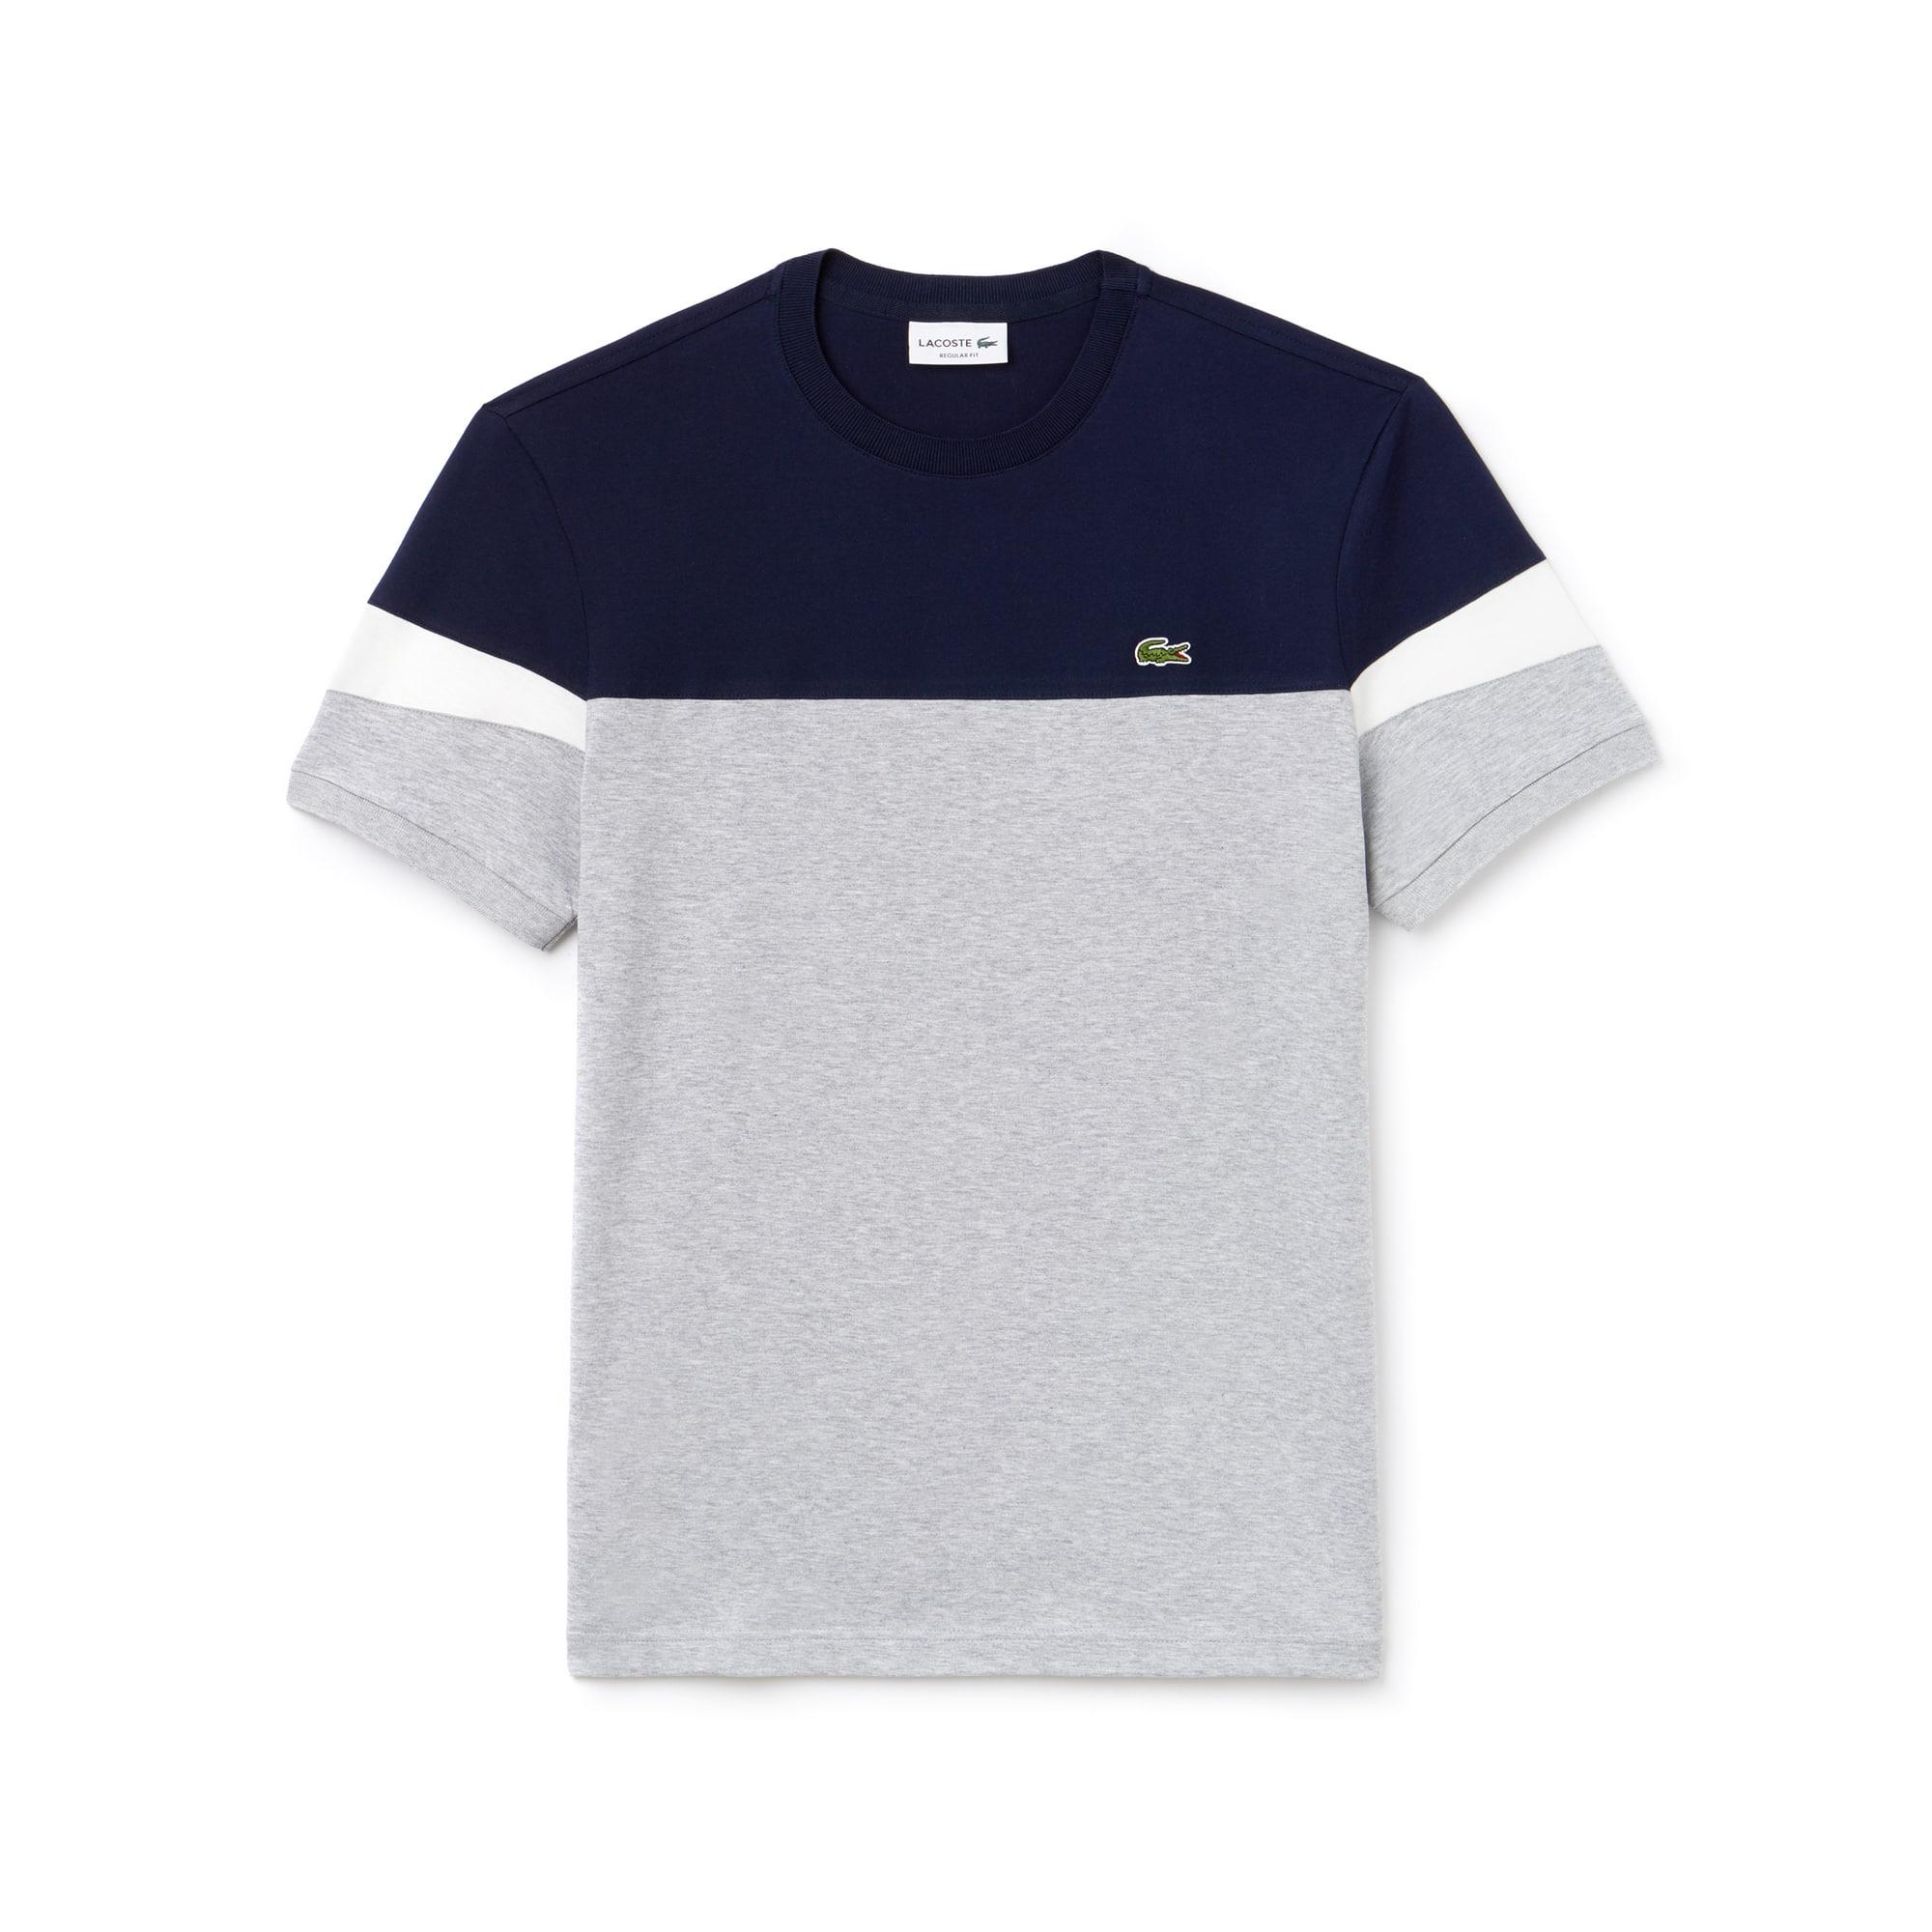 Men's Crew Neck Colorblock Soft Jersey T-shirt